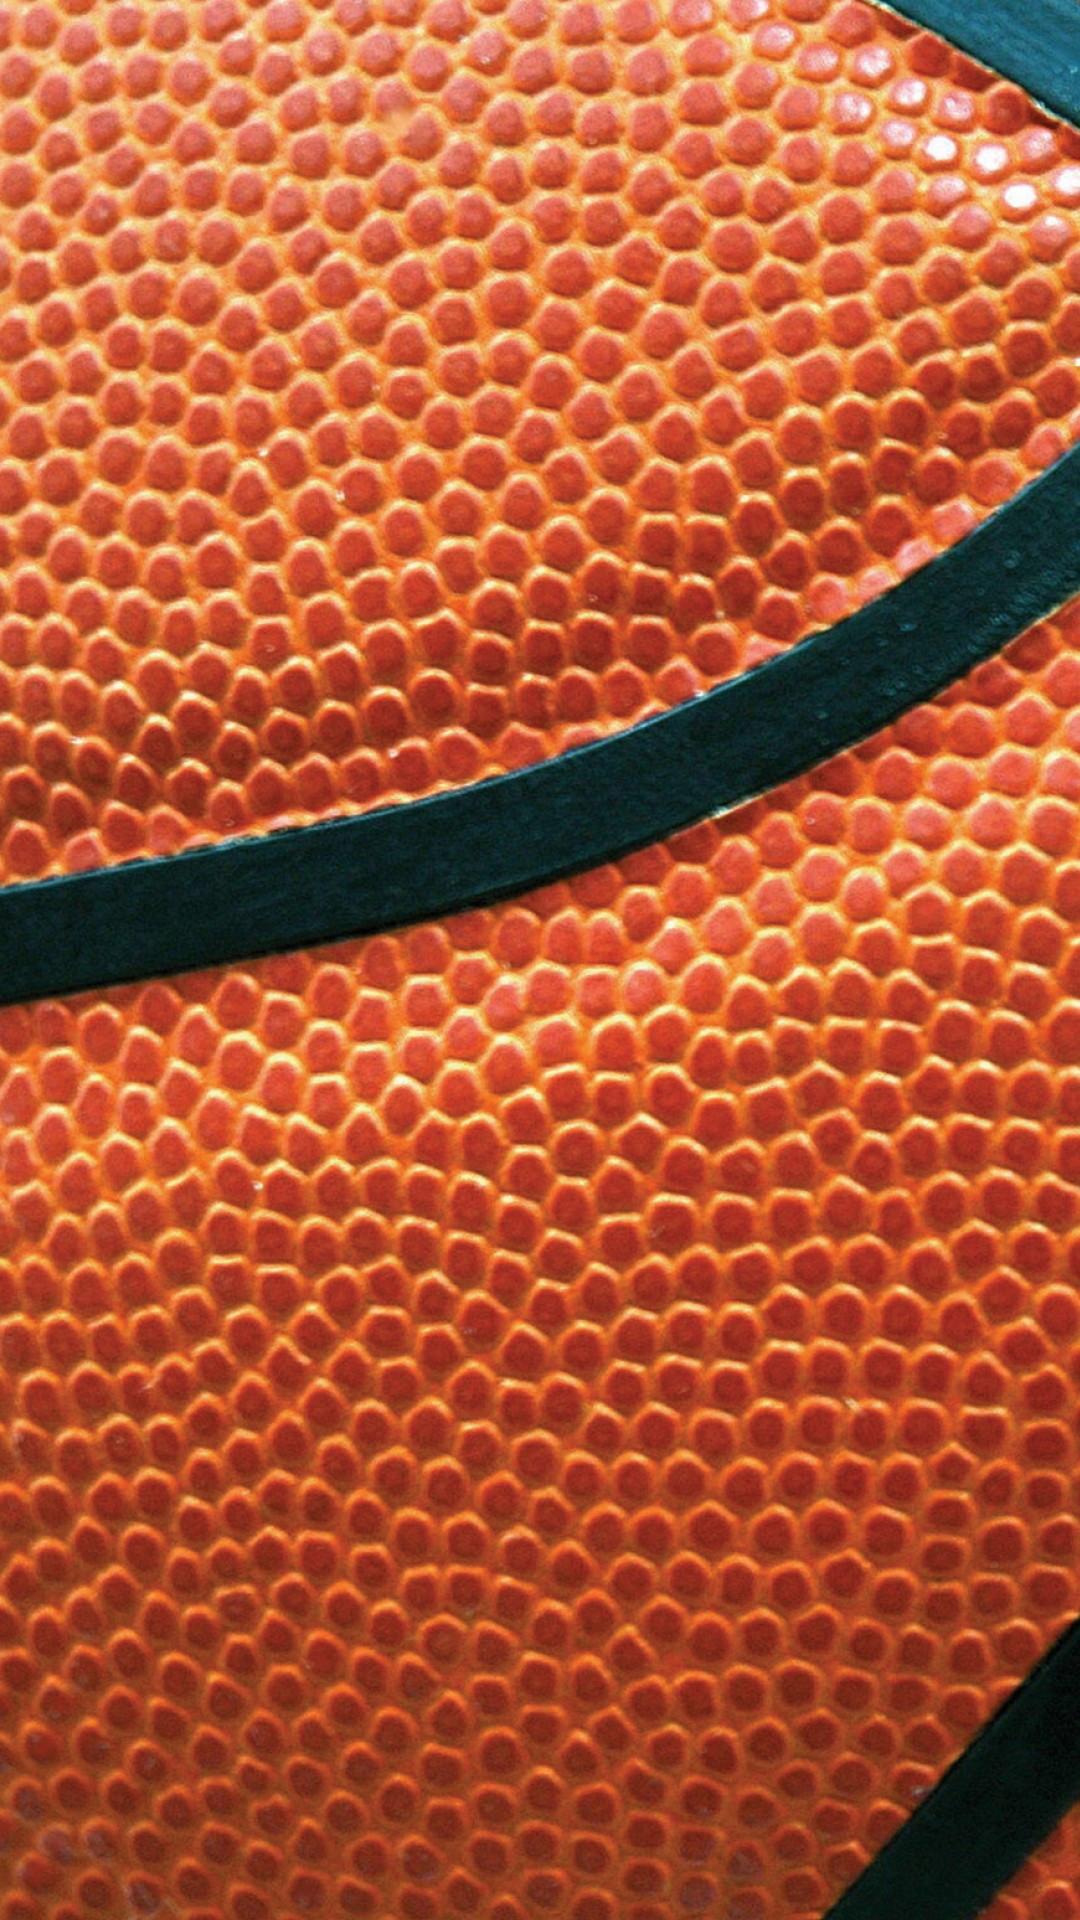 Basketball Close-up Android Wallpaper …